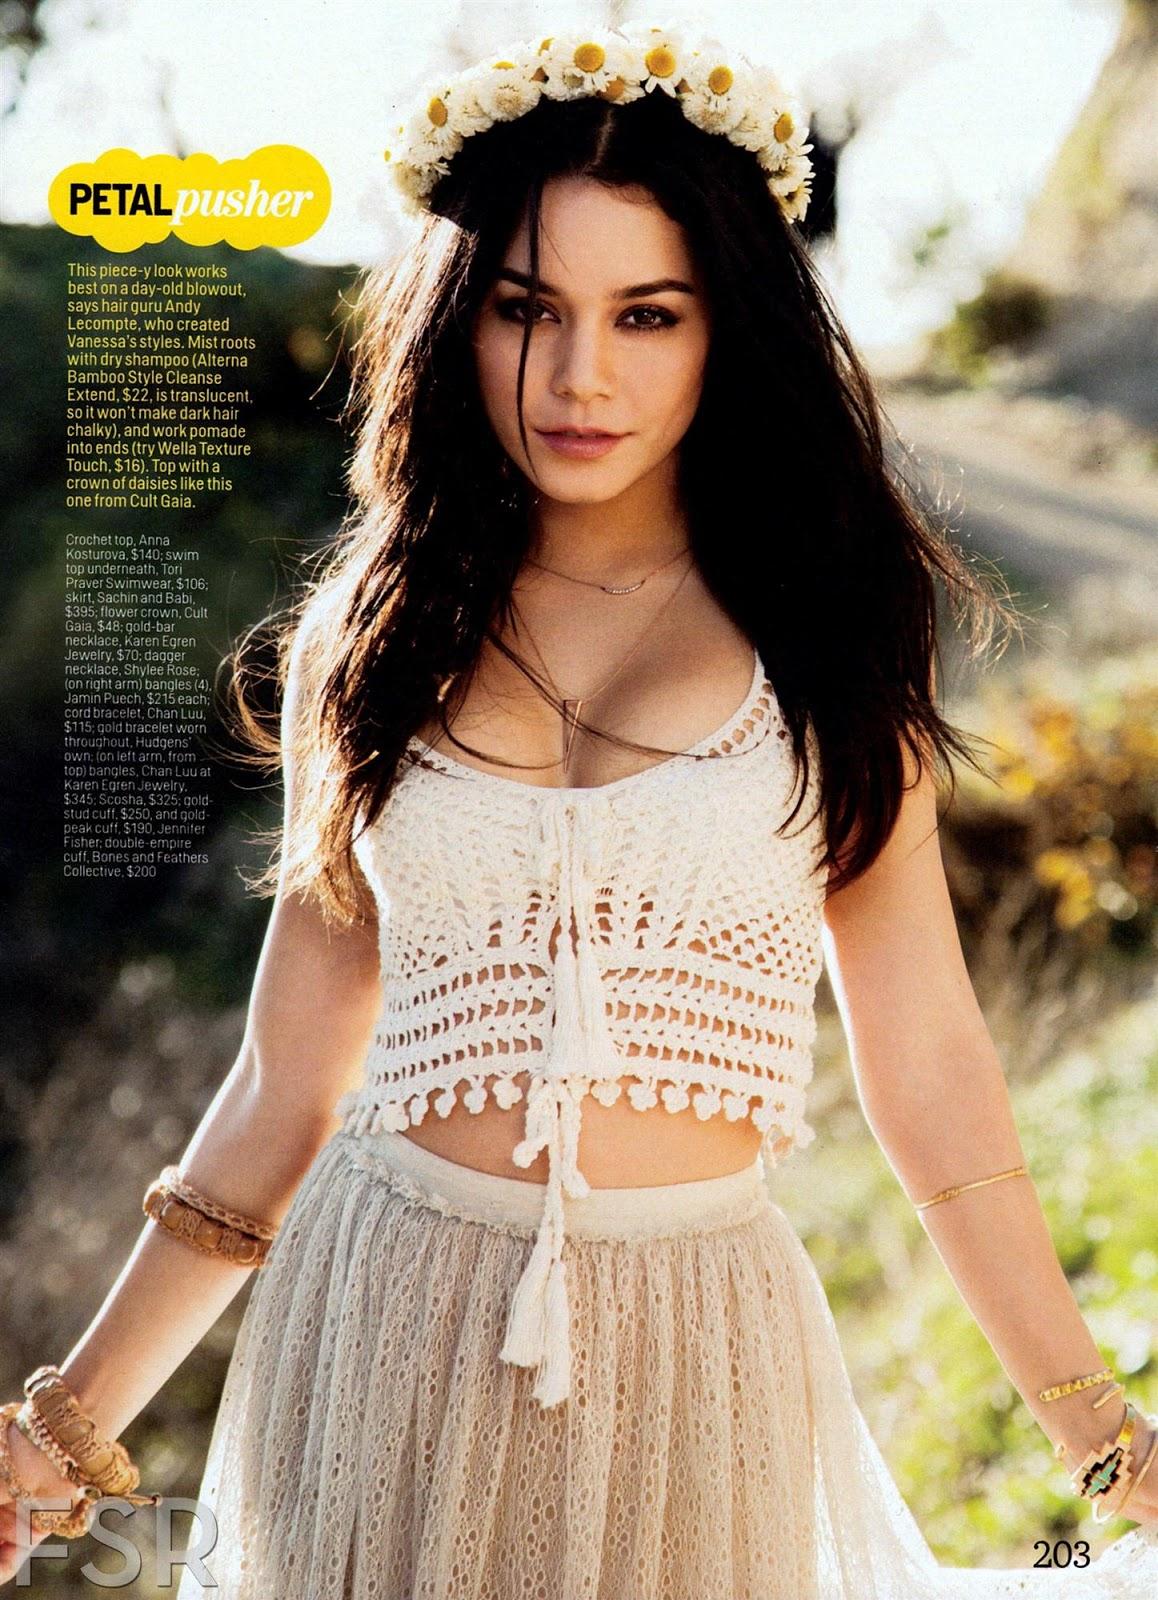 Vanessa Hudgens Photoshoot for Cosmopolitan Magazine April 2013